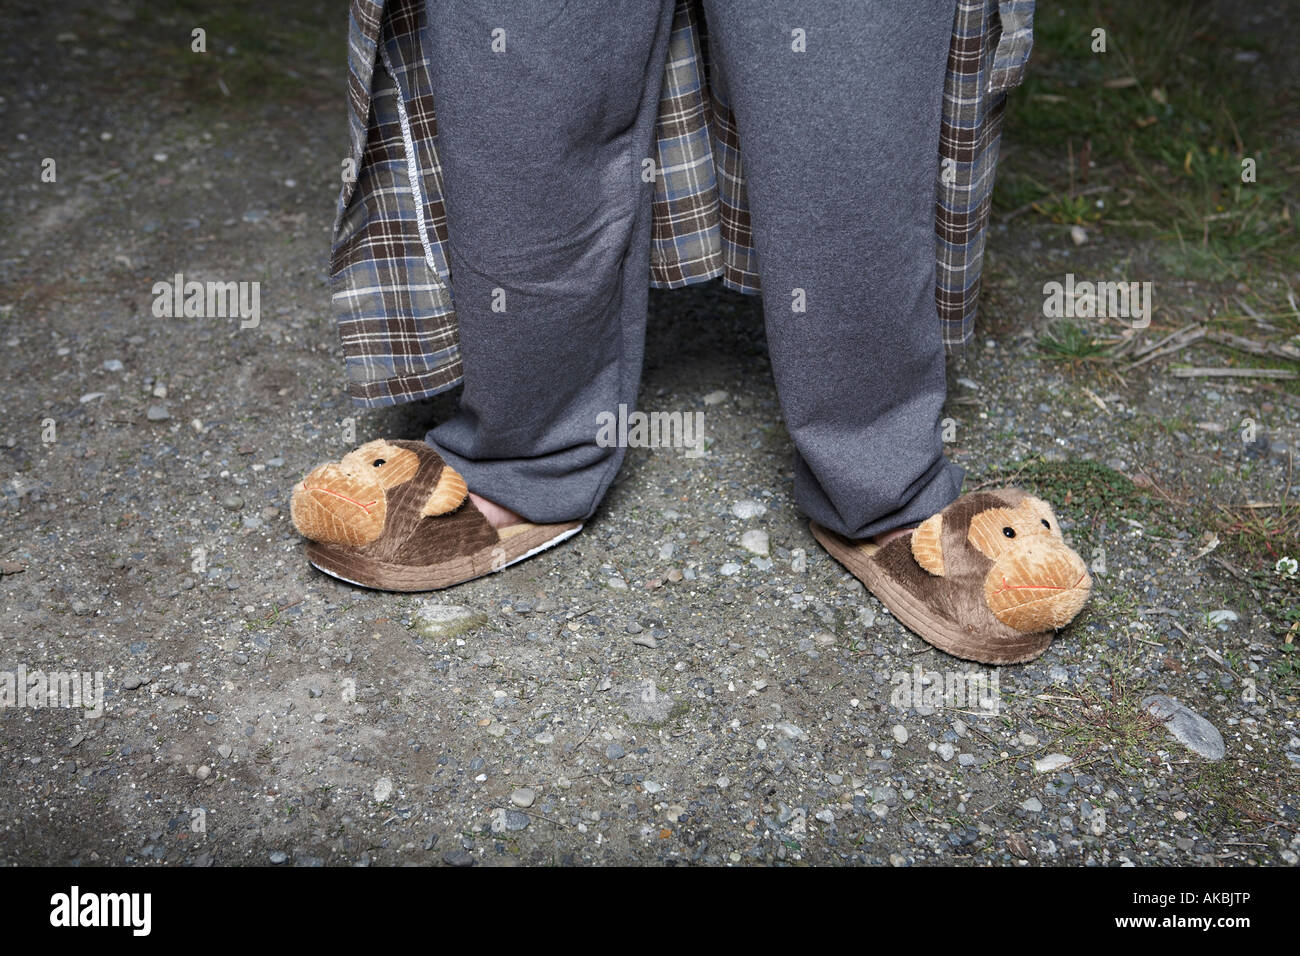 Man wearing monkey slippers on gravel road - Stock Image